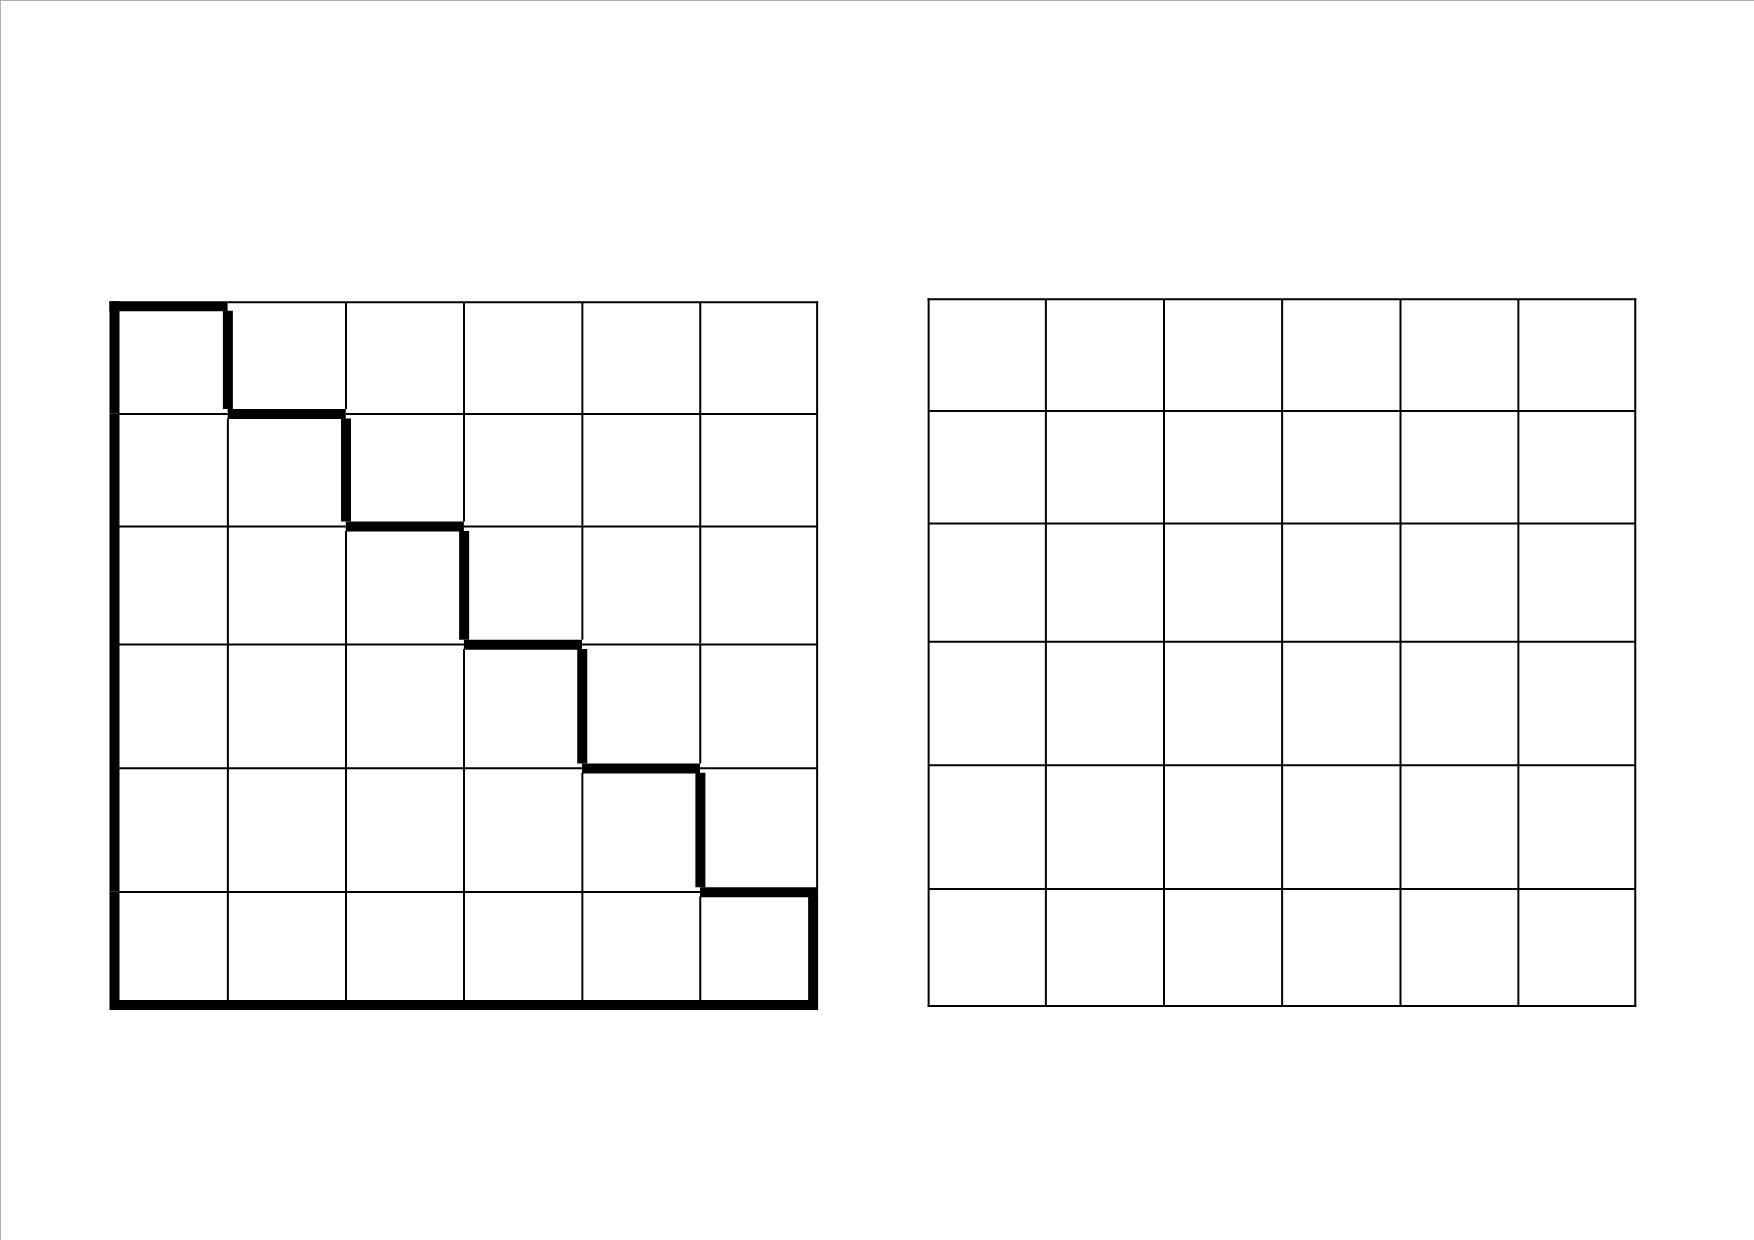 werkboekje ruimtelijk inzicht 7 quadrillage tableaux double entr e triple entr e pixel. Black Bedroom Furniture Sets. Home Design Ideas